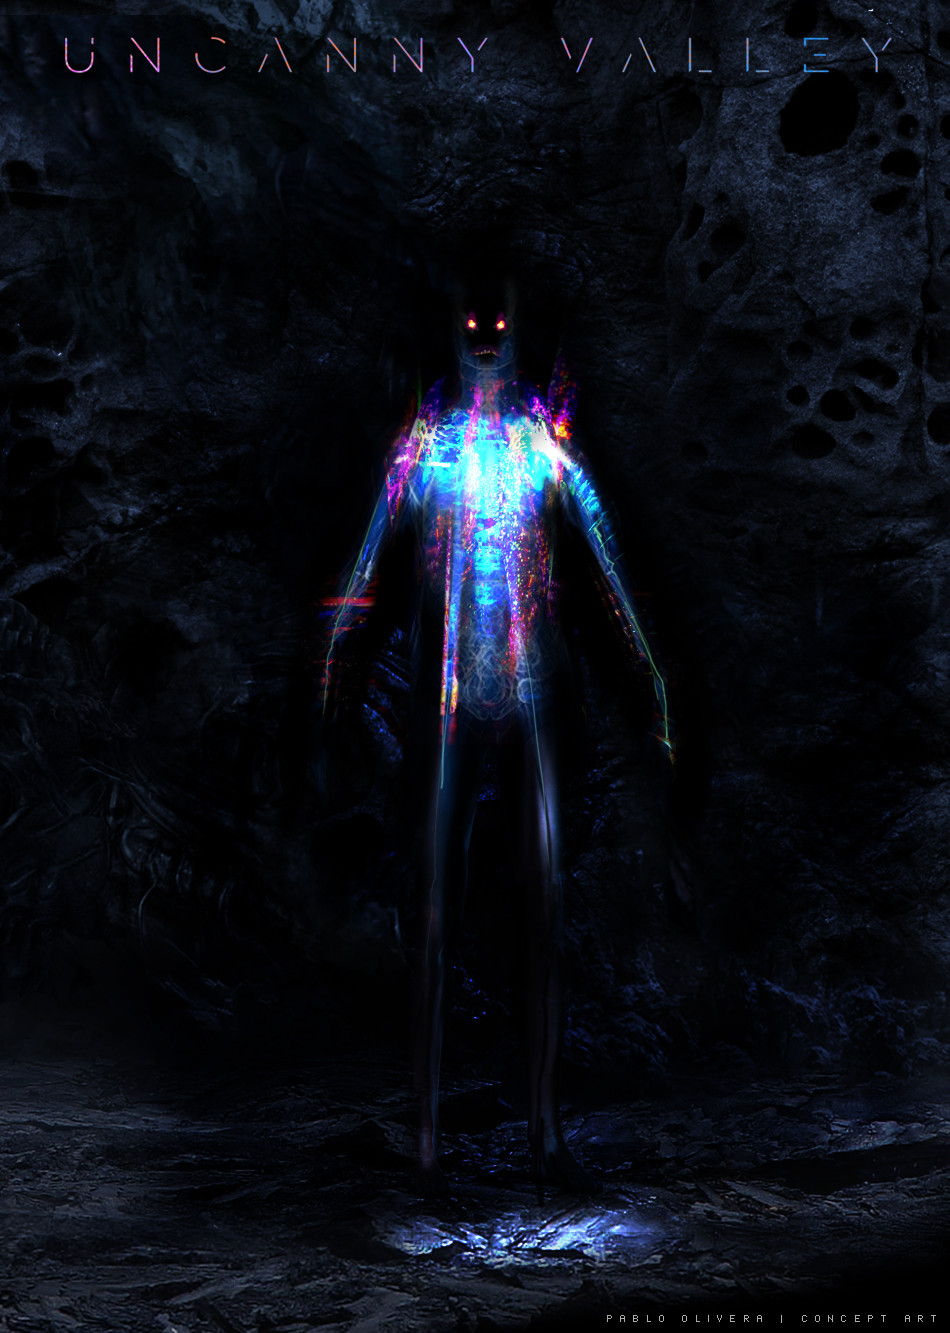 Pablo olivera uncanny valley character design alien 12